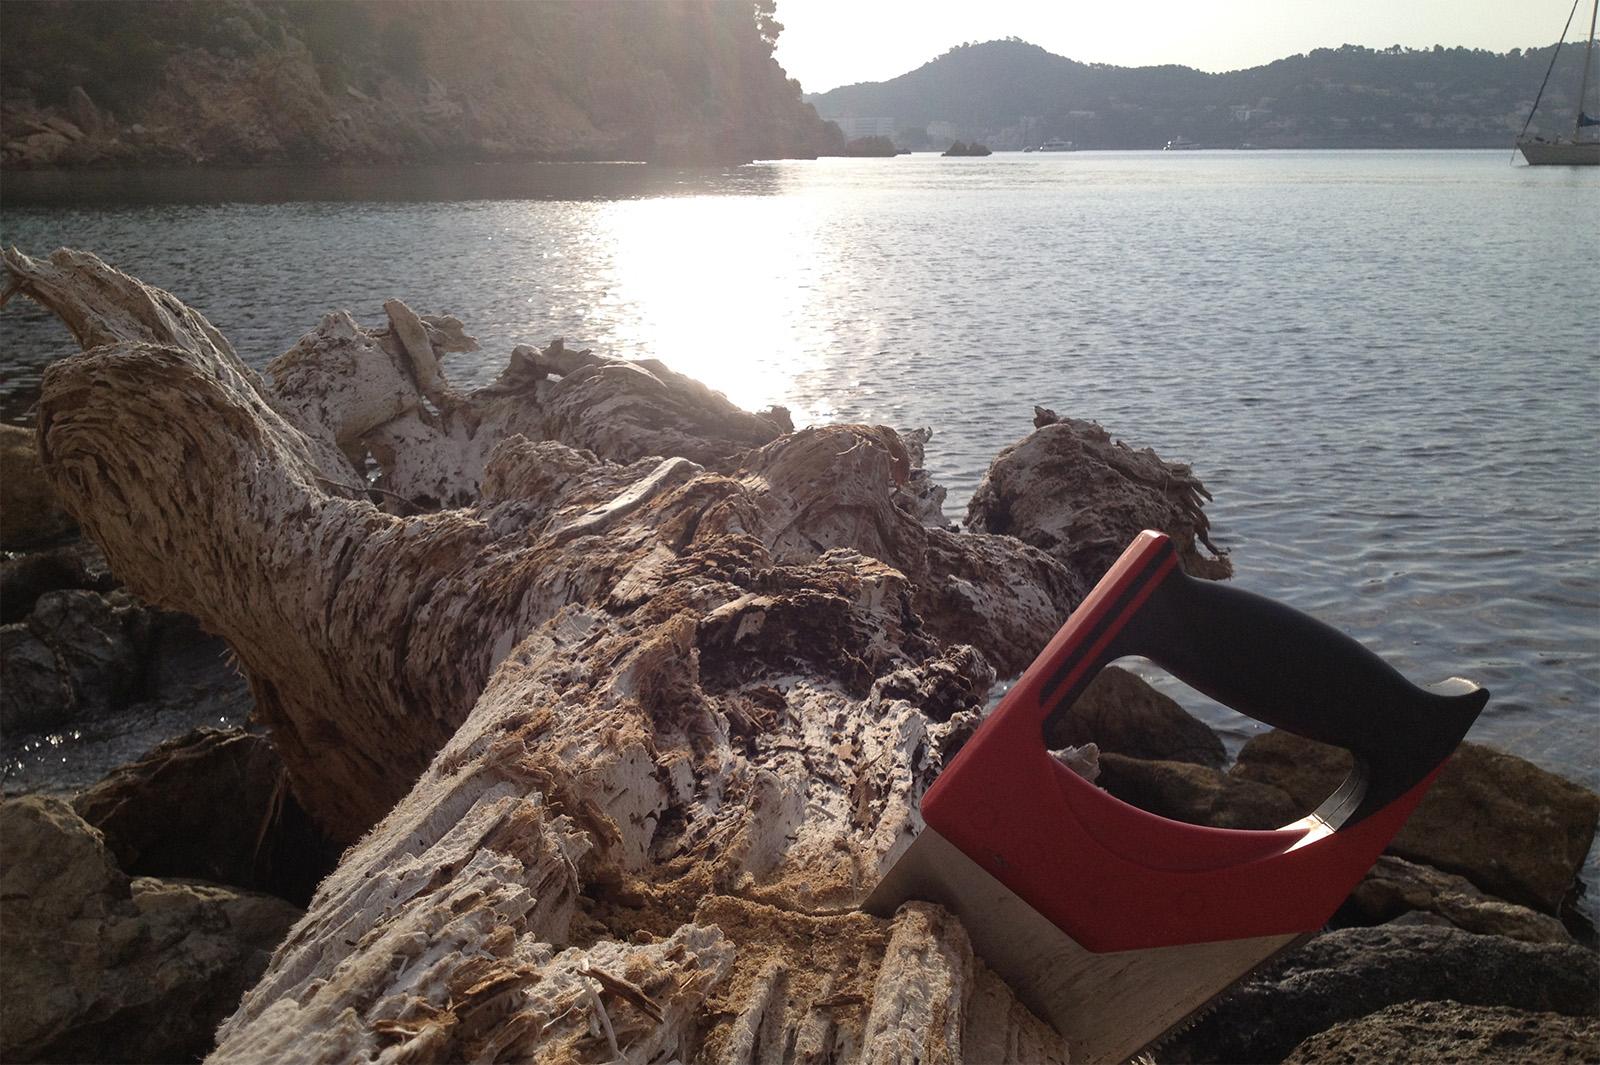 Driftwood at Mediterranean Sea